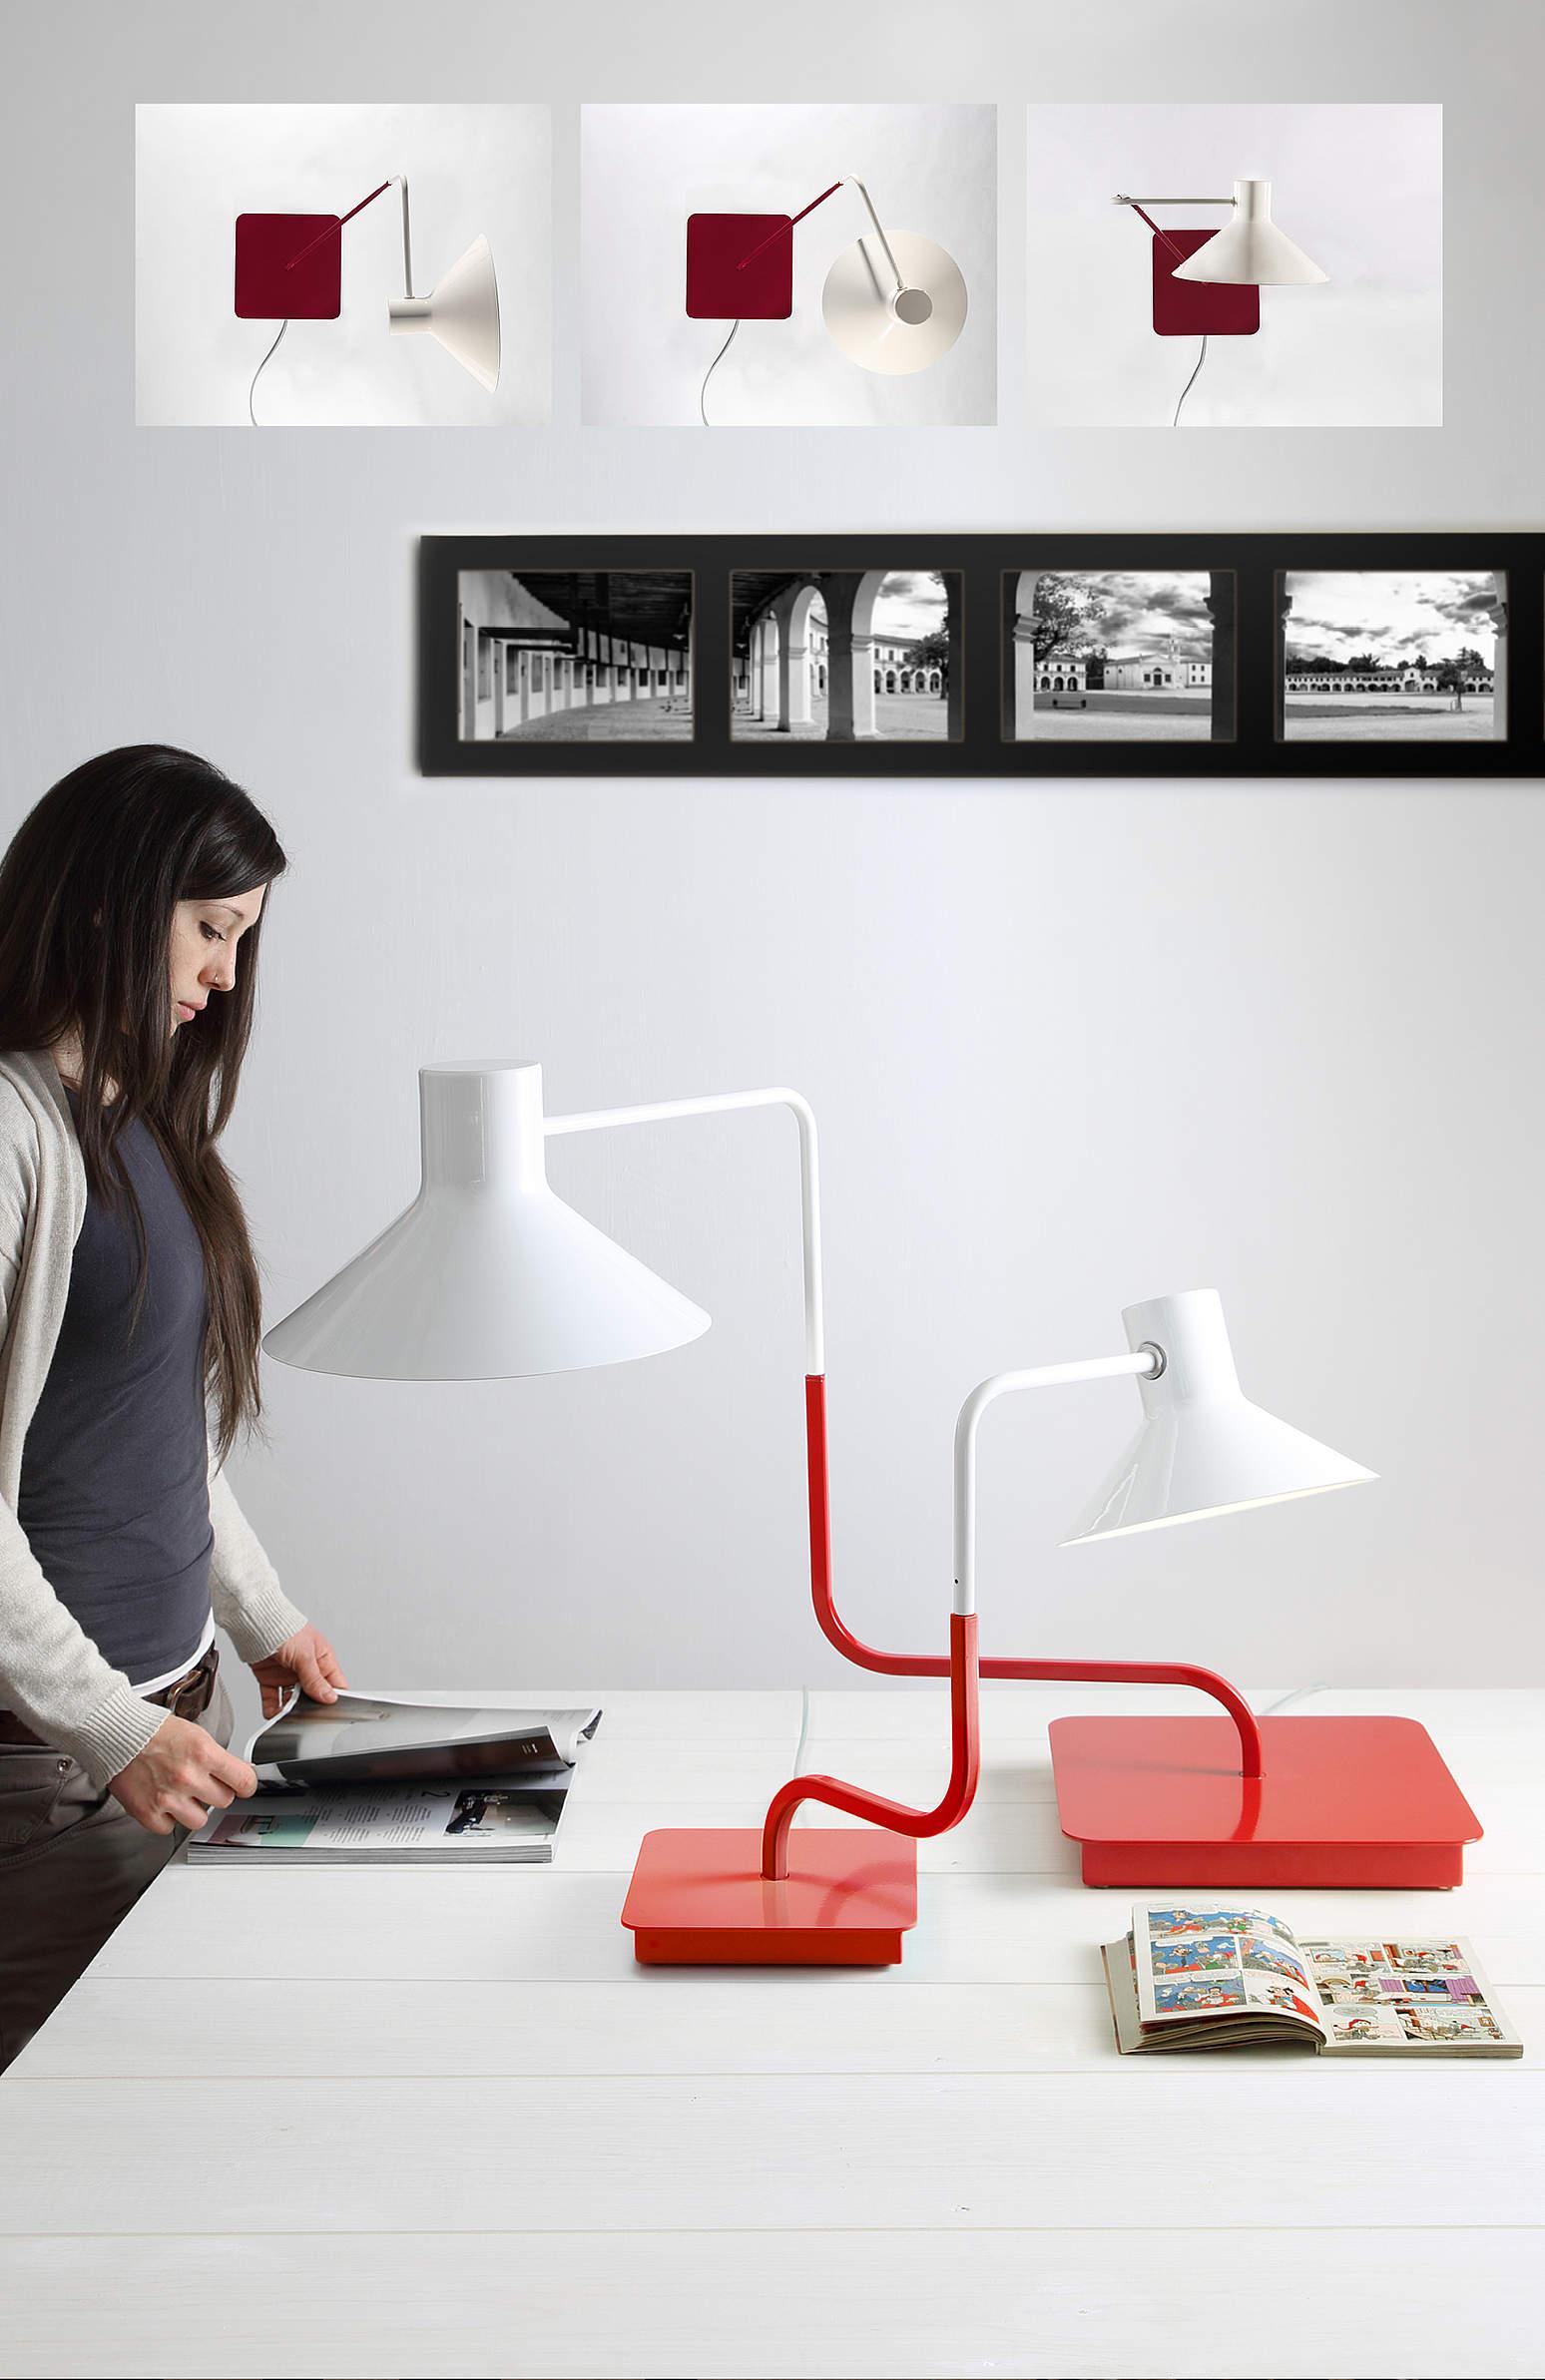 Sister Lamp by Enrico Azzimonti for Zava